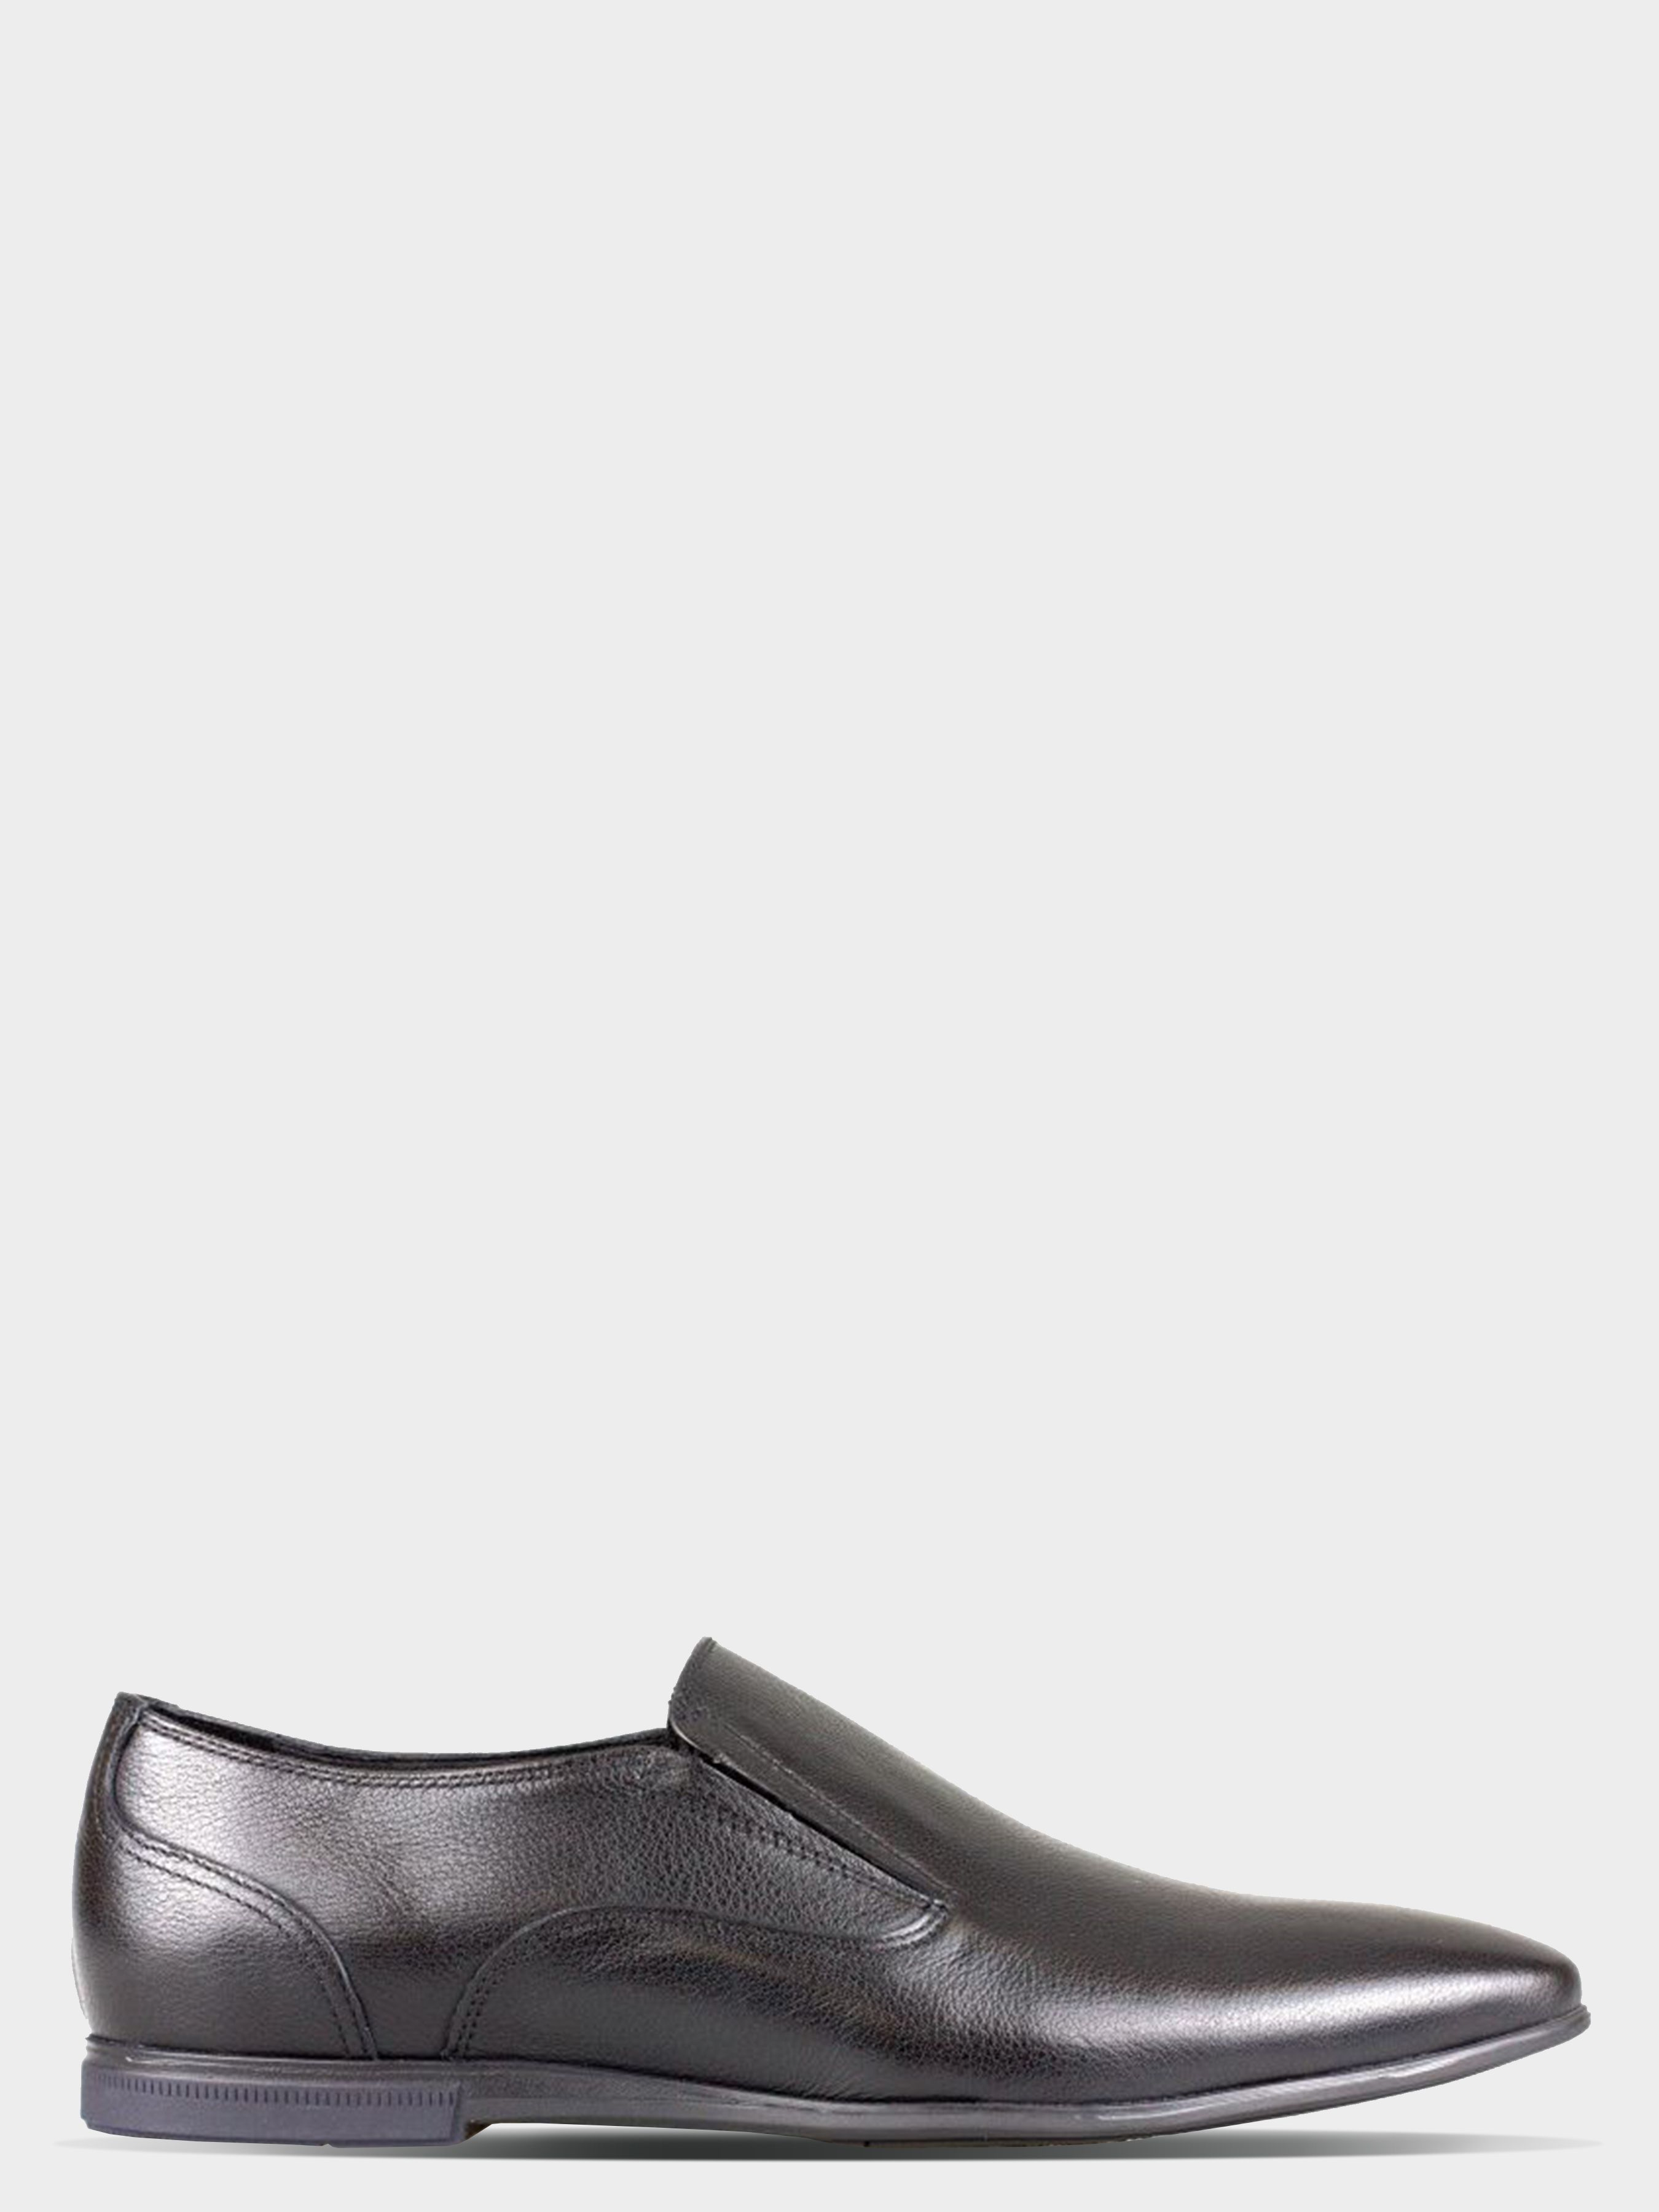 Туфли мужские Braska BR1508 цена обуви, 2017